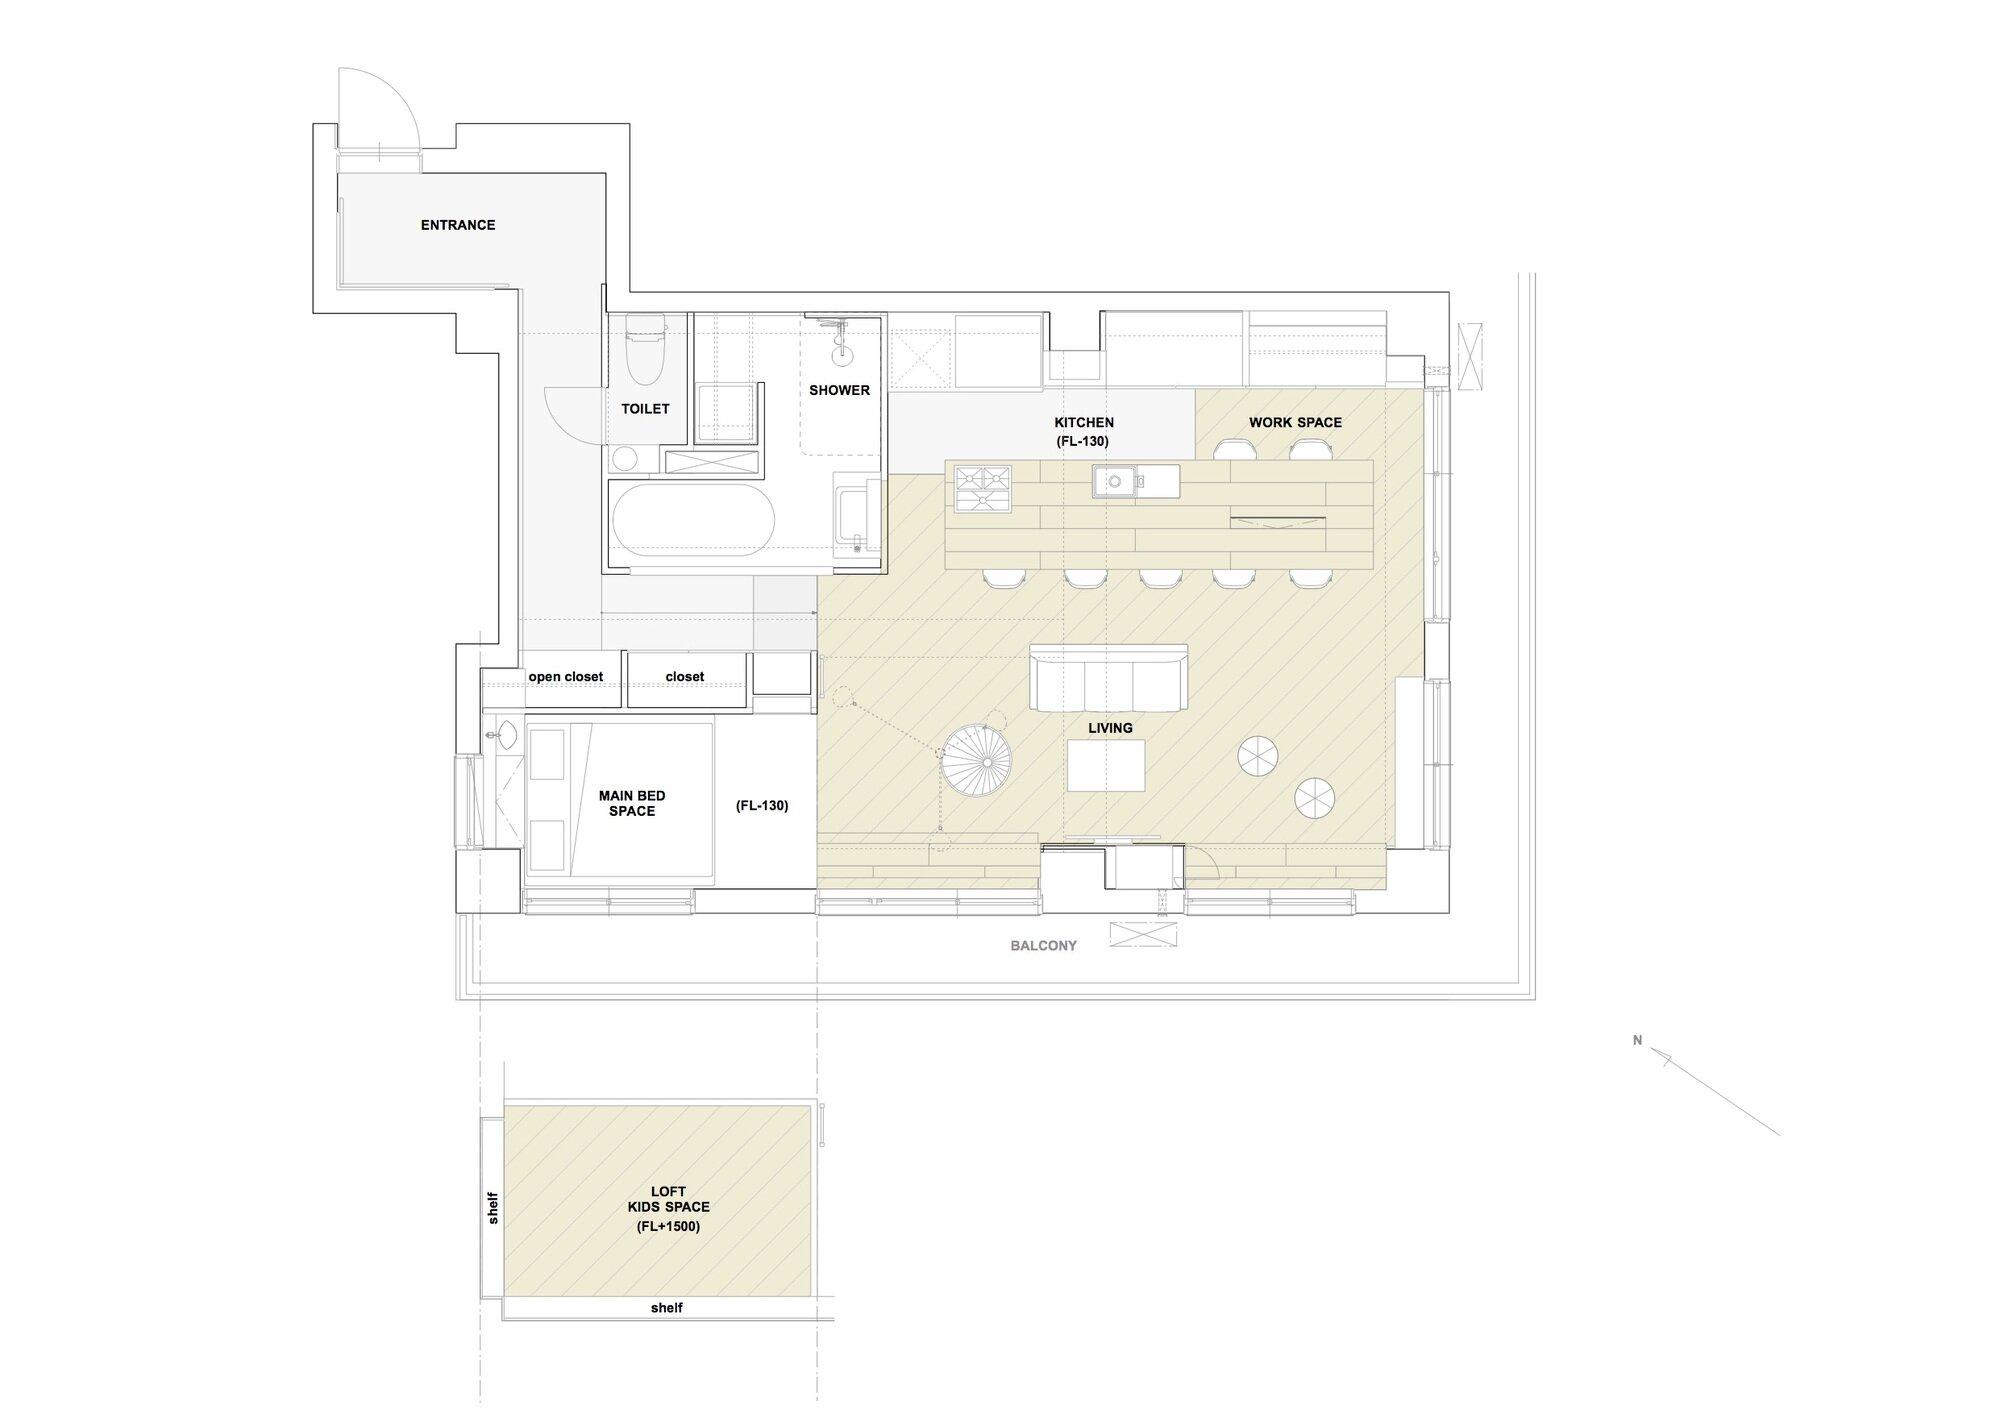 Tenhachi House - .8 Tenhachi Architect & Interior Design - Tokyo - Floor Plan - Humble Homes